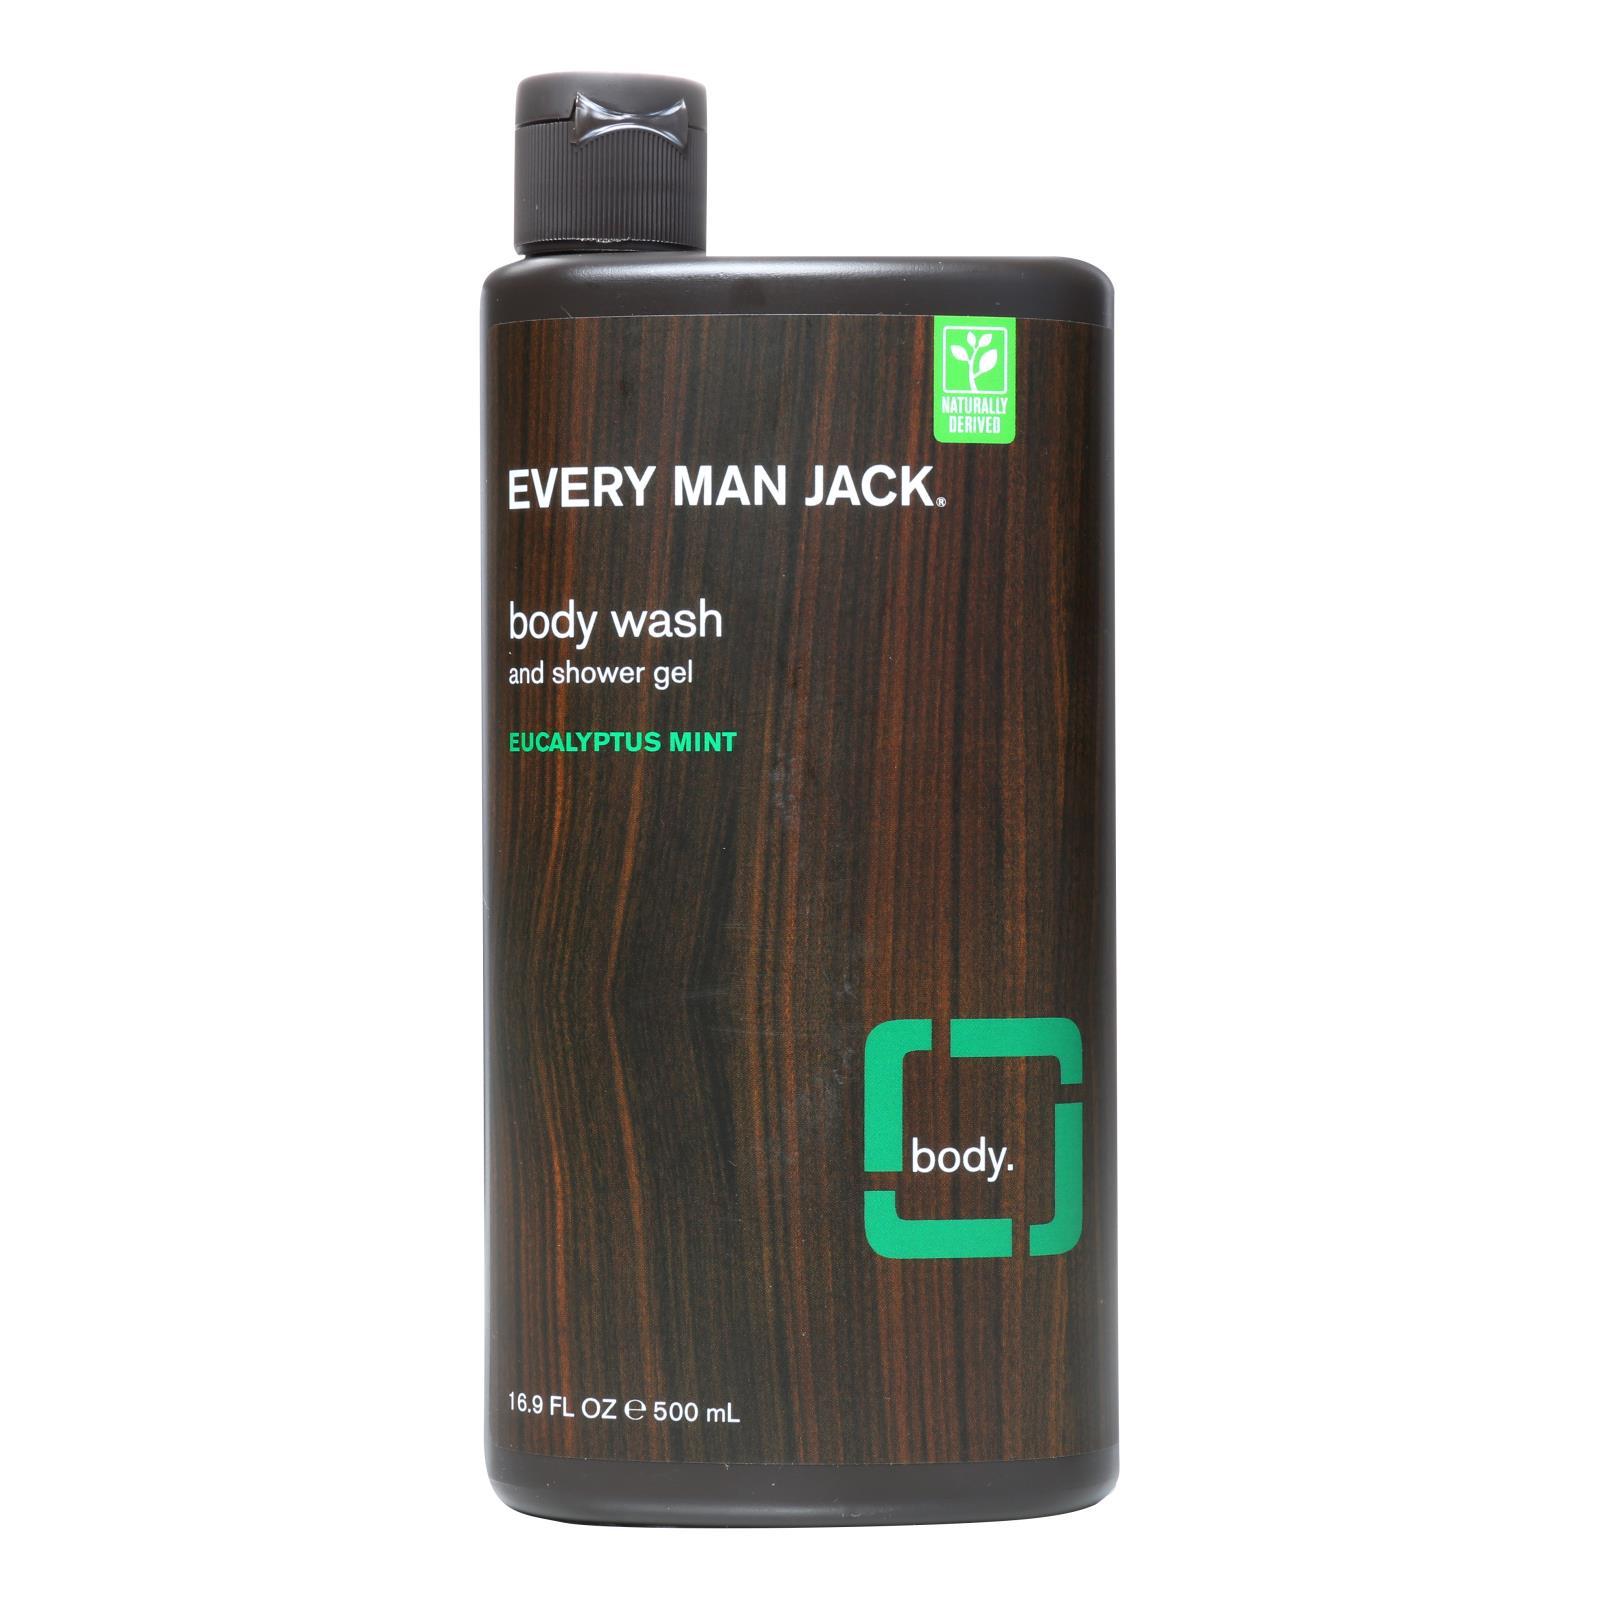 Every Man Jack Eucalyptus Mint Body Wash And Shower Gel  - 1 Each - 16.9 OZ